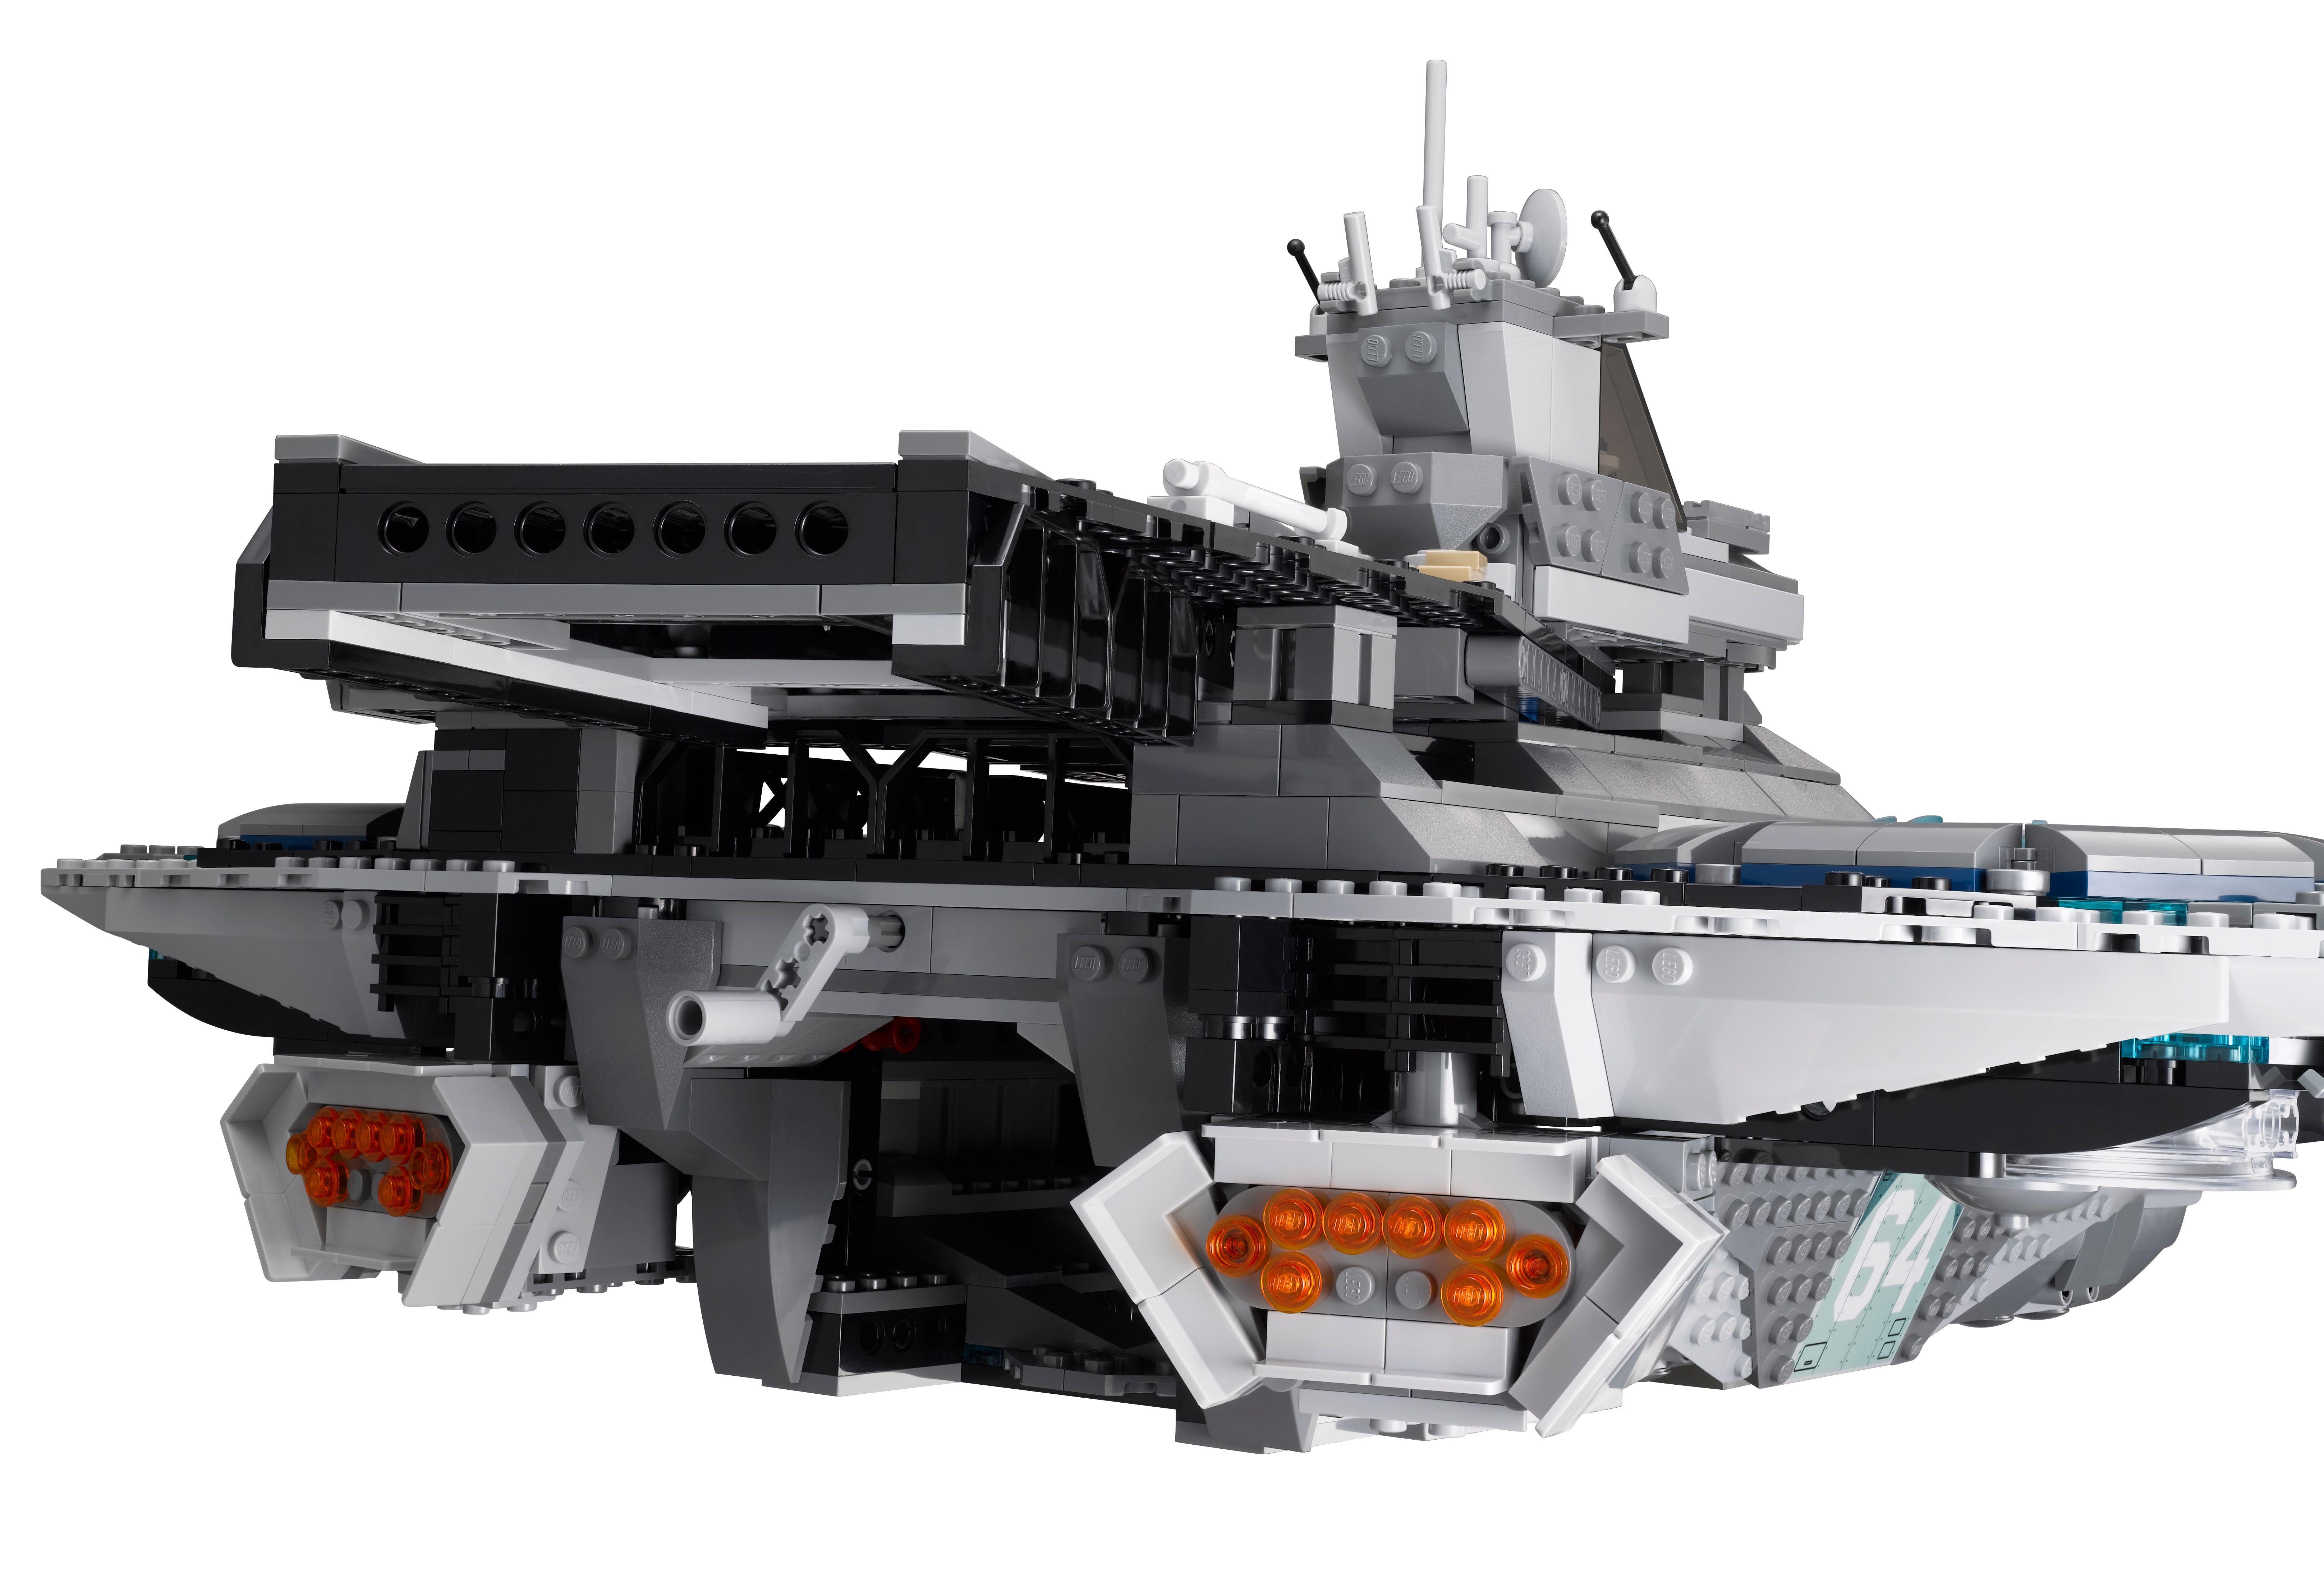 Lego Helicarrier Avengers Image 13